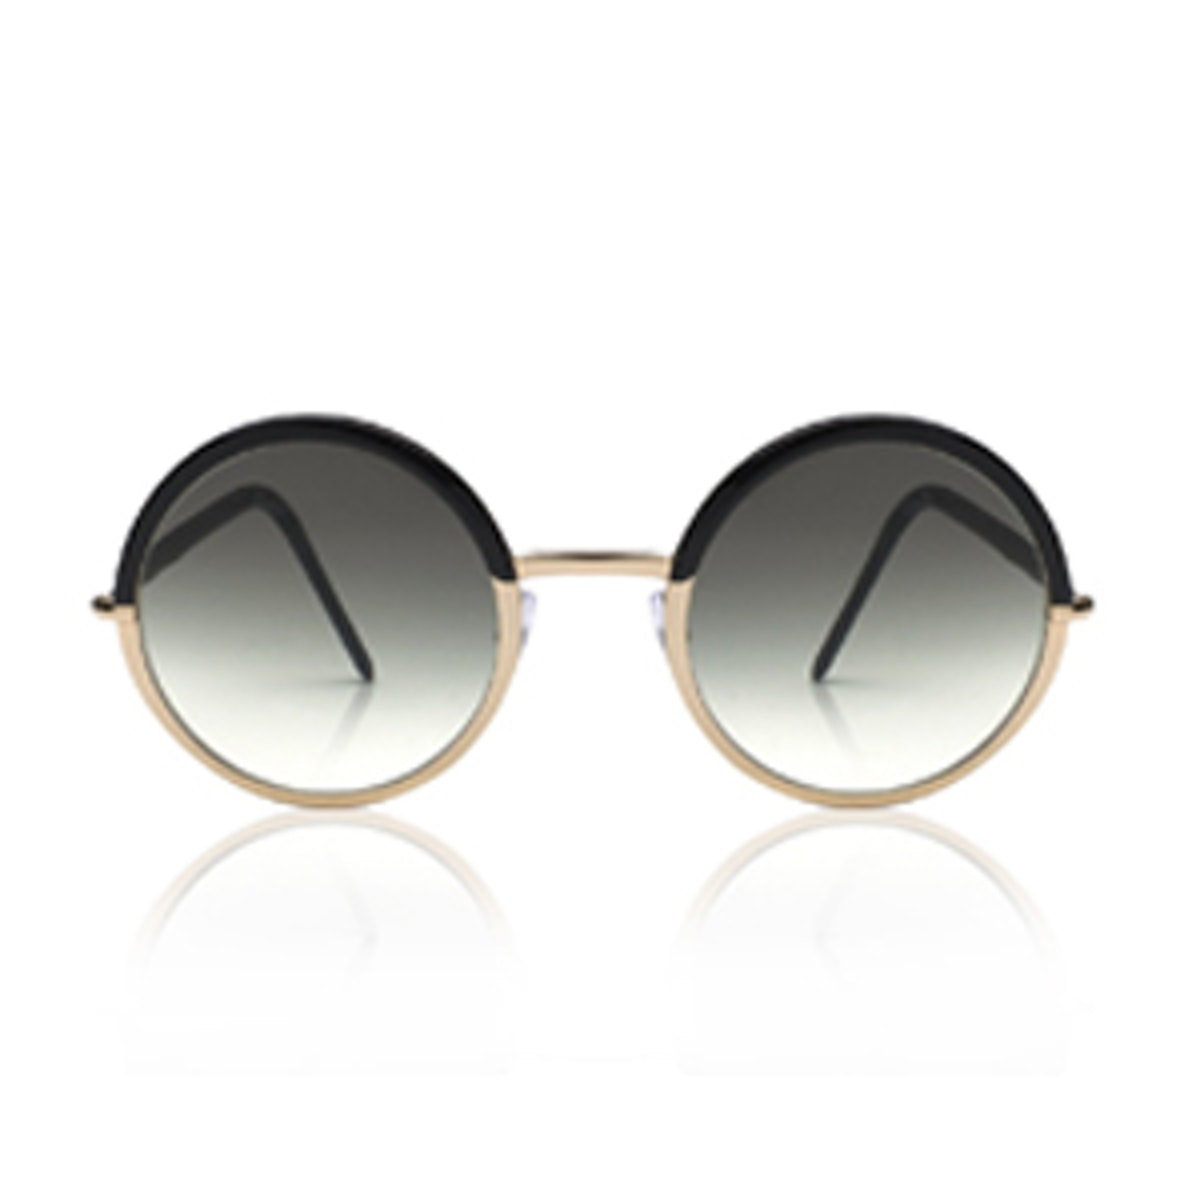 Two Tone Round Gradient Sunglasses